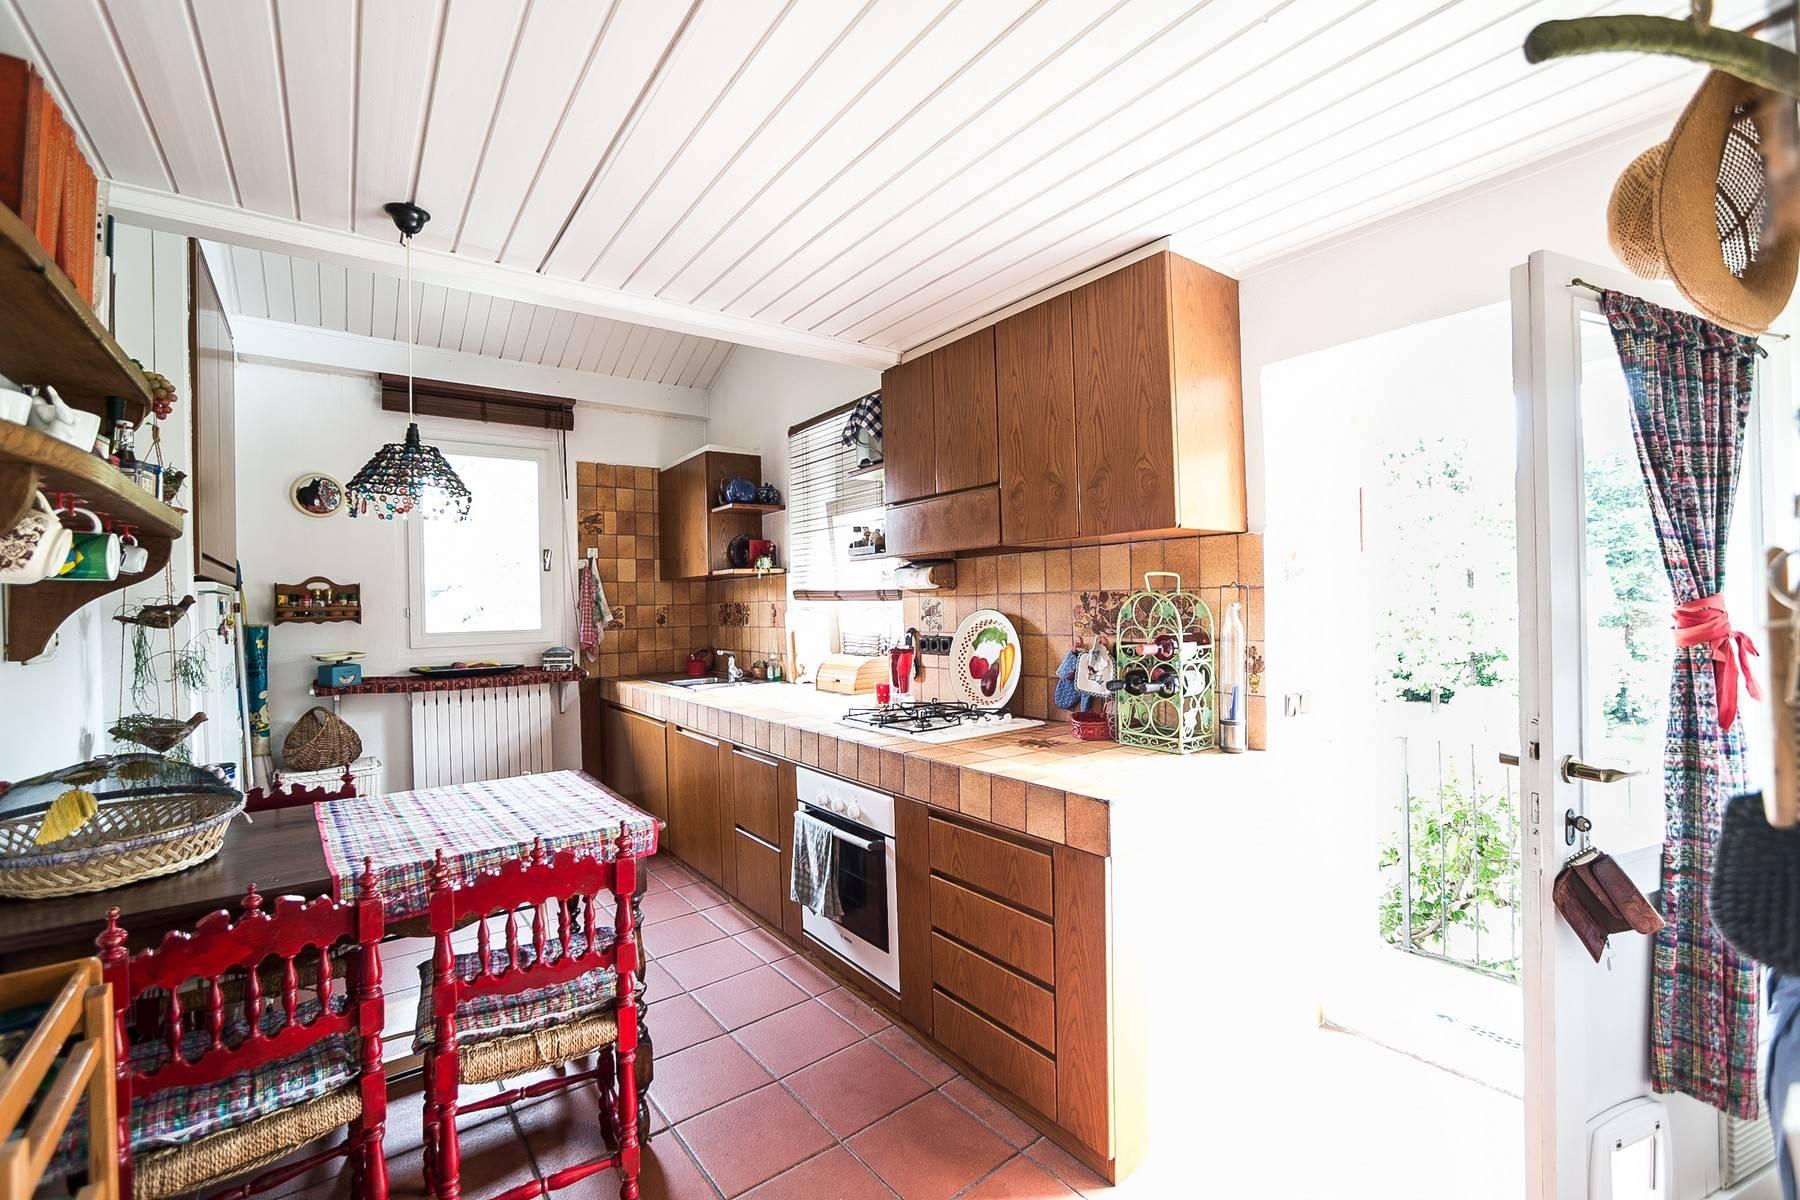 Villa in Vendita a Carimate: 5 locali, 800 mq - Foto 12